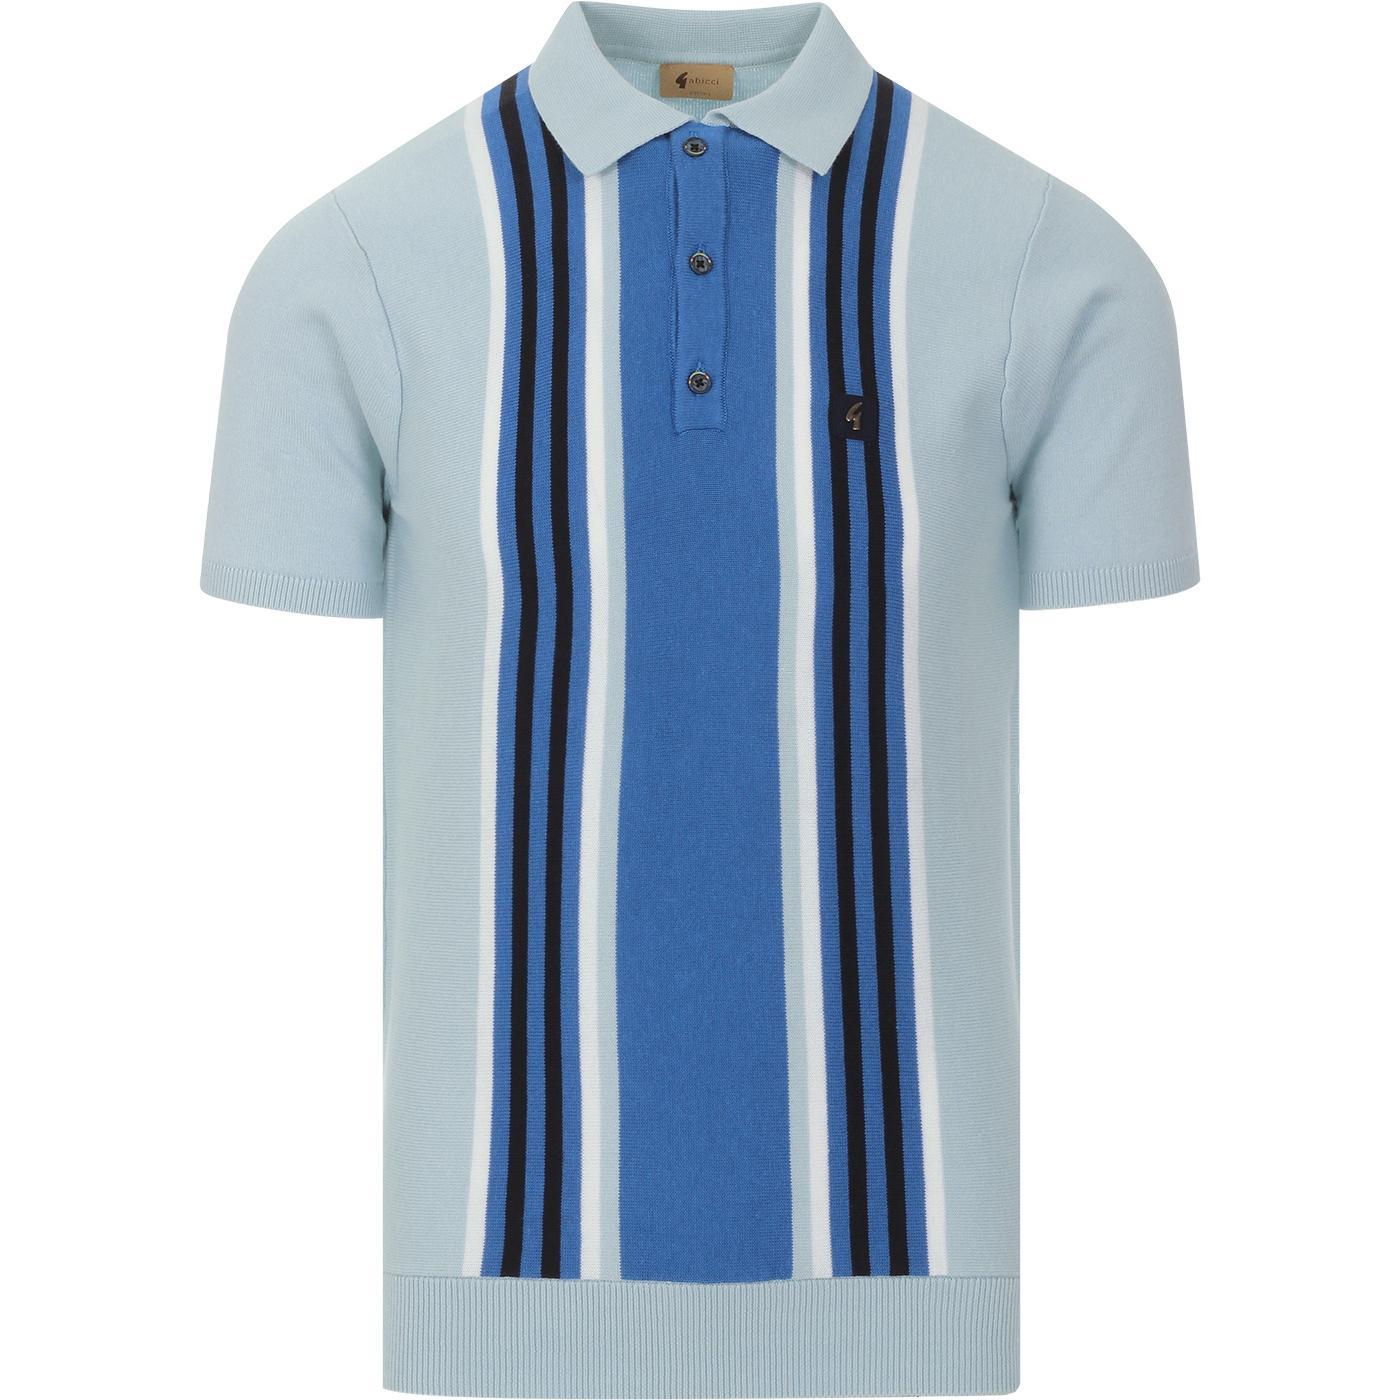 Casbah GABICCI VINTAGE Mod Stripe Knit Polo SHADE